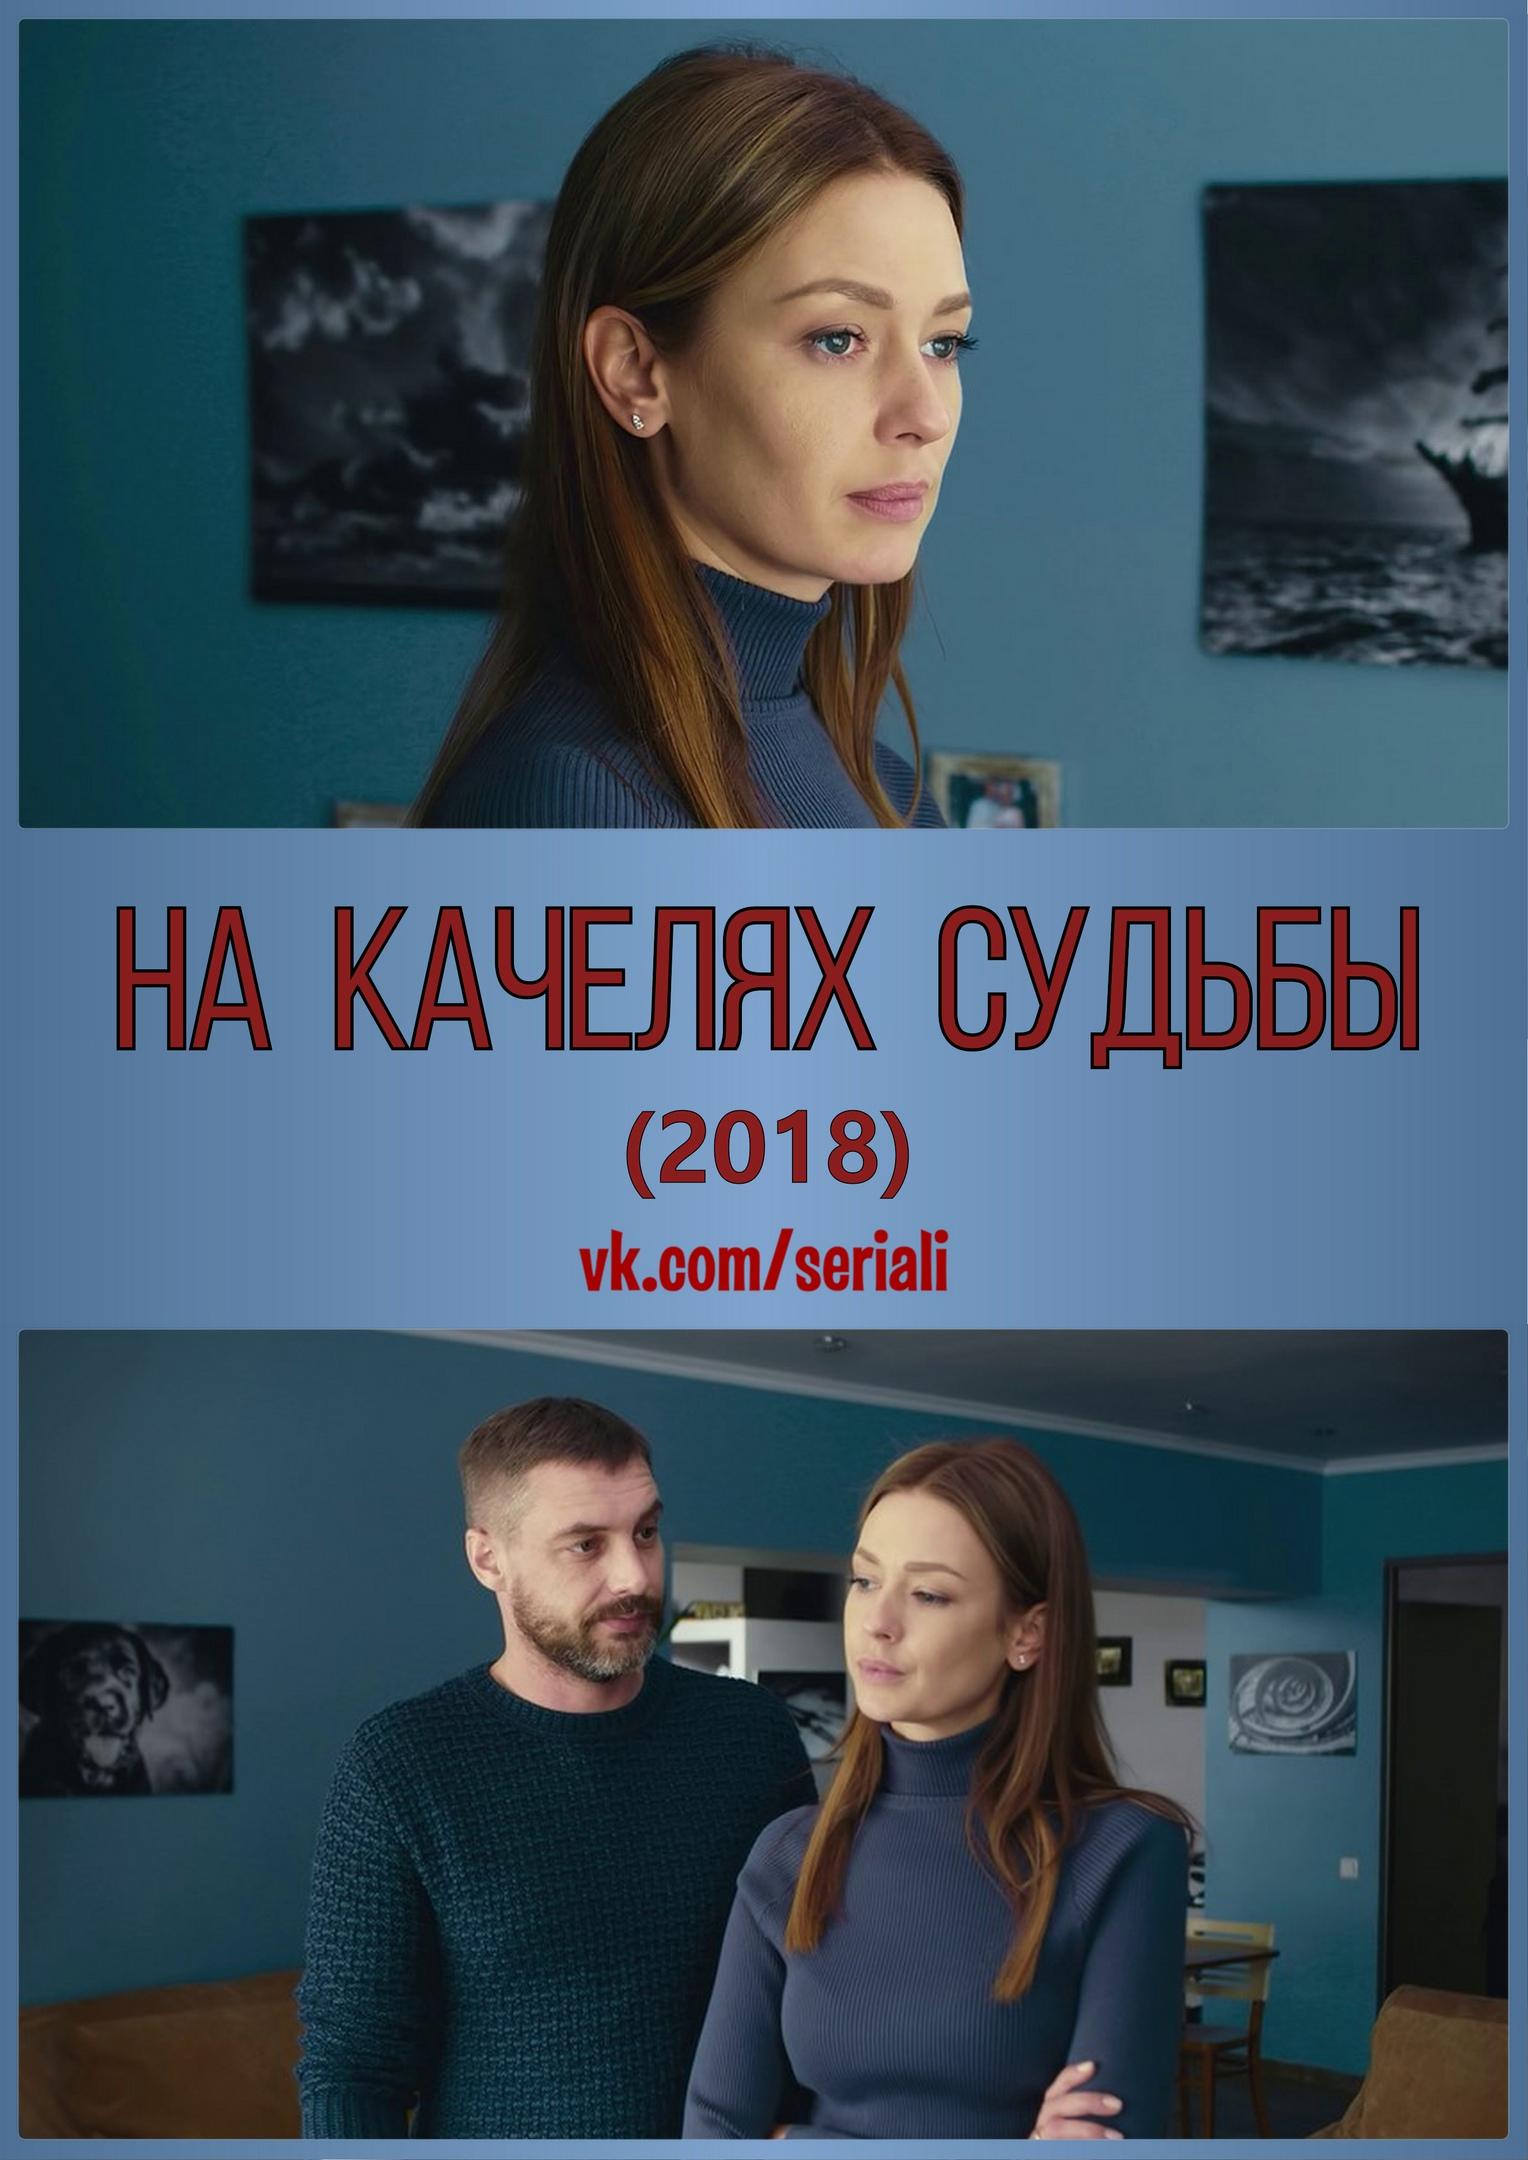 Мелодрама «Ha кaчeляx cyдьбы» (2018) 1-4 серия из 4 HD